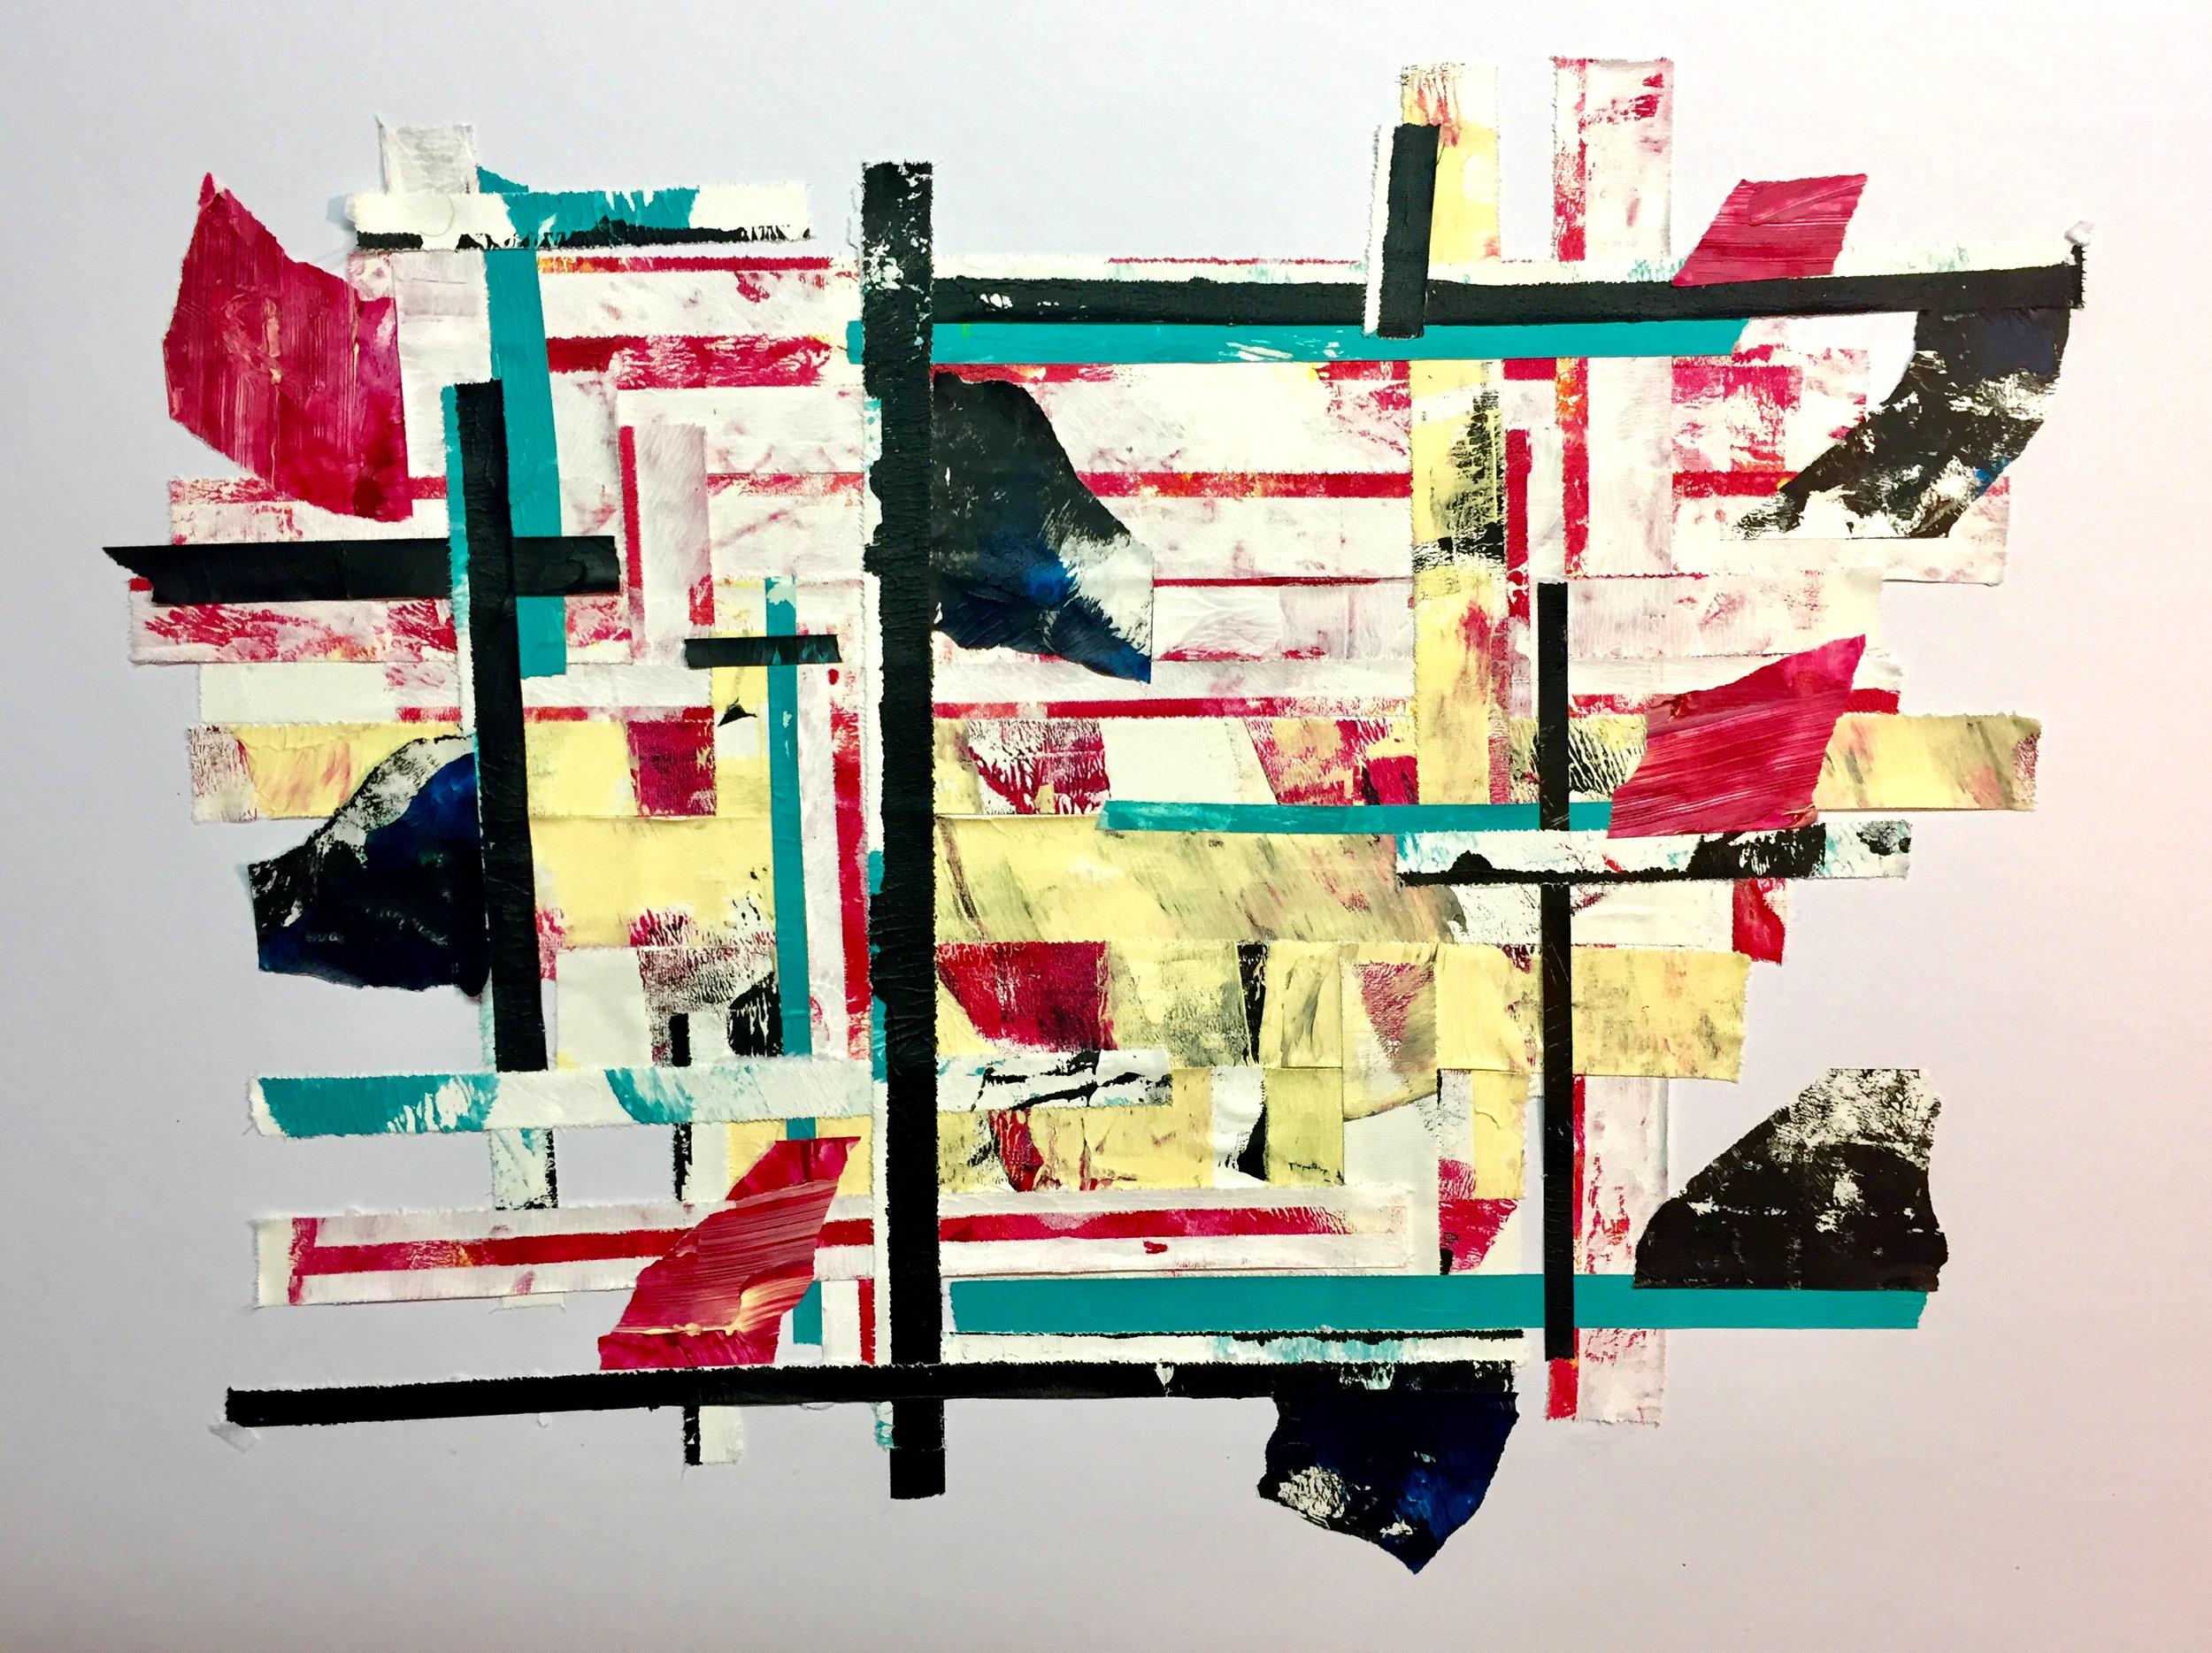 Untitled 16x20